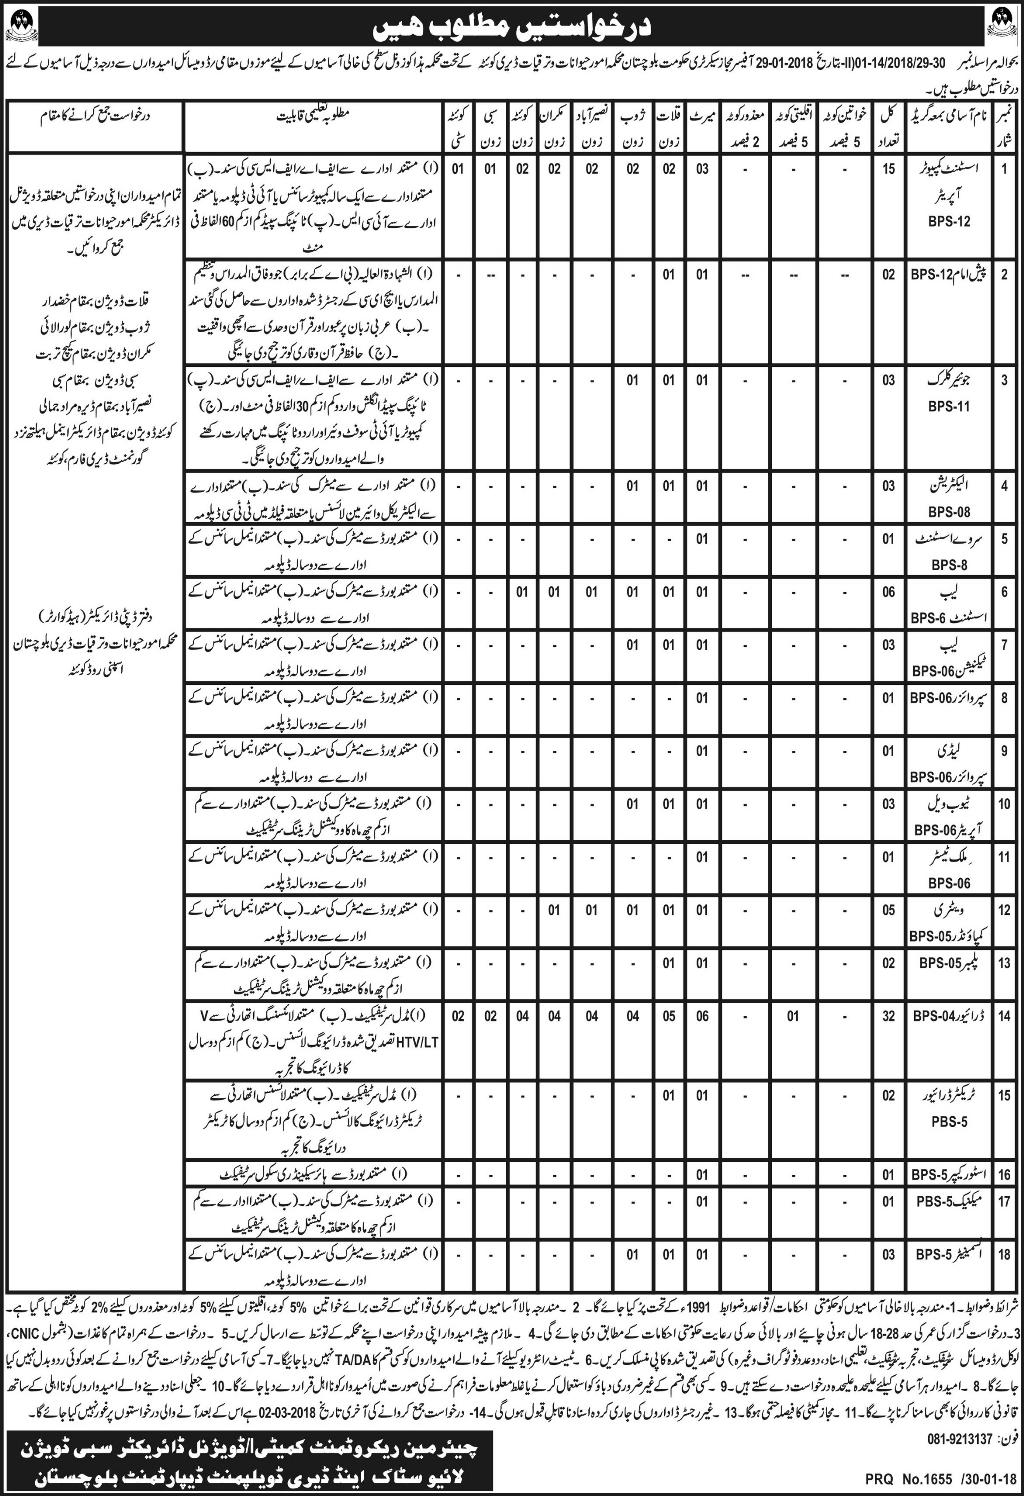 Baluchistan Live Stock and Dairy Development 75 Jobs, 31/01/2018 Daily Express Newspaper